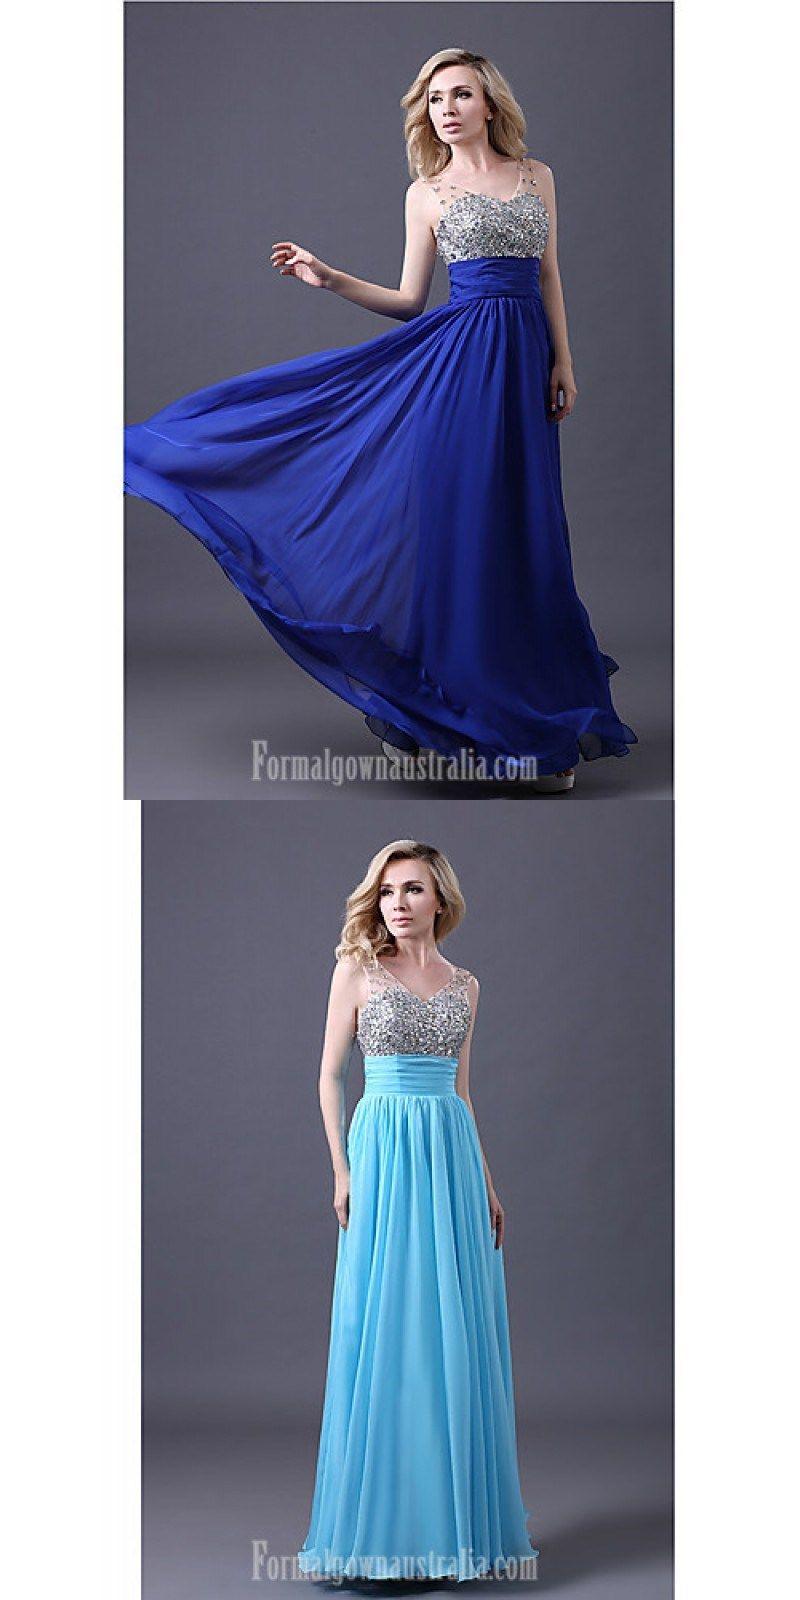 Australia Formal Dress Evening Gowns Lilac Royal Blue Pool Ruby White Plus Sizes Dresses Petite A Line Sweetheart Long Floor Length Chiffon White Plus Size Dresses Evening Dresses Formal Dresses [ 1600 x 800 Pixel ]